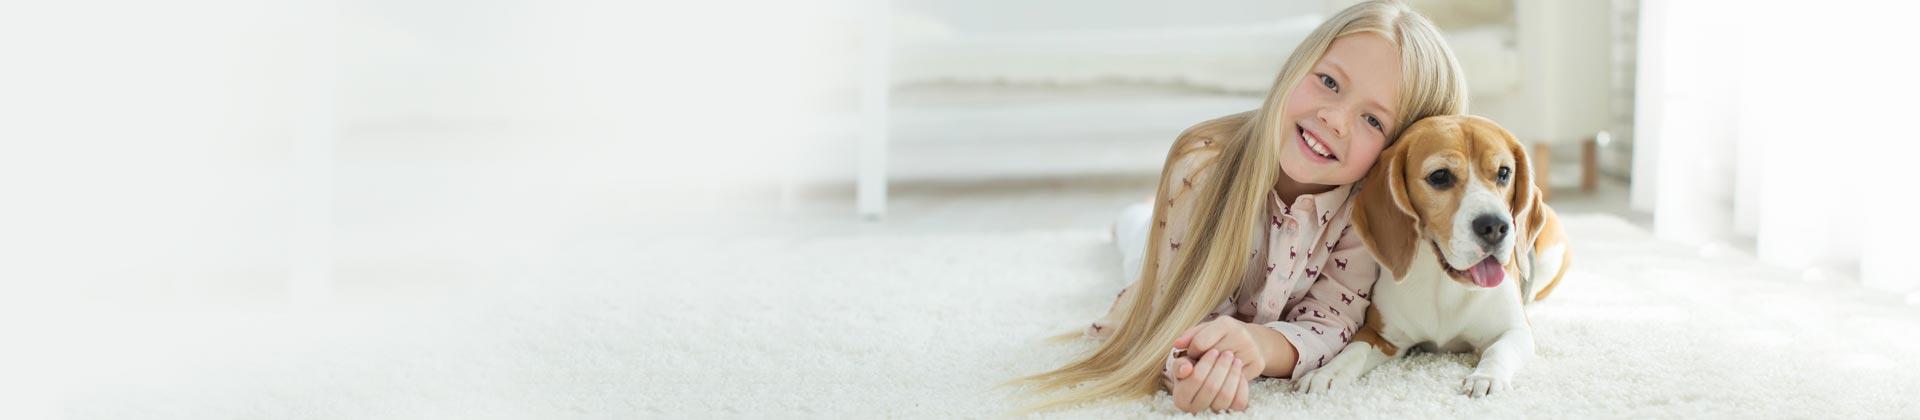 girl-and-dog-on-carpet